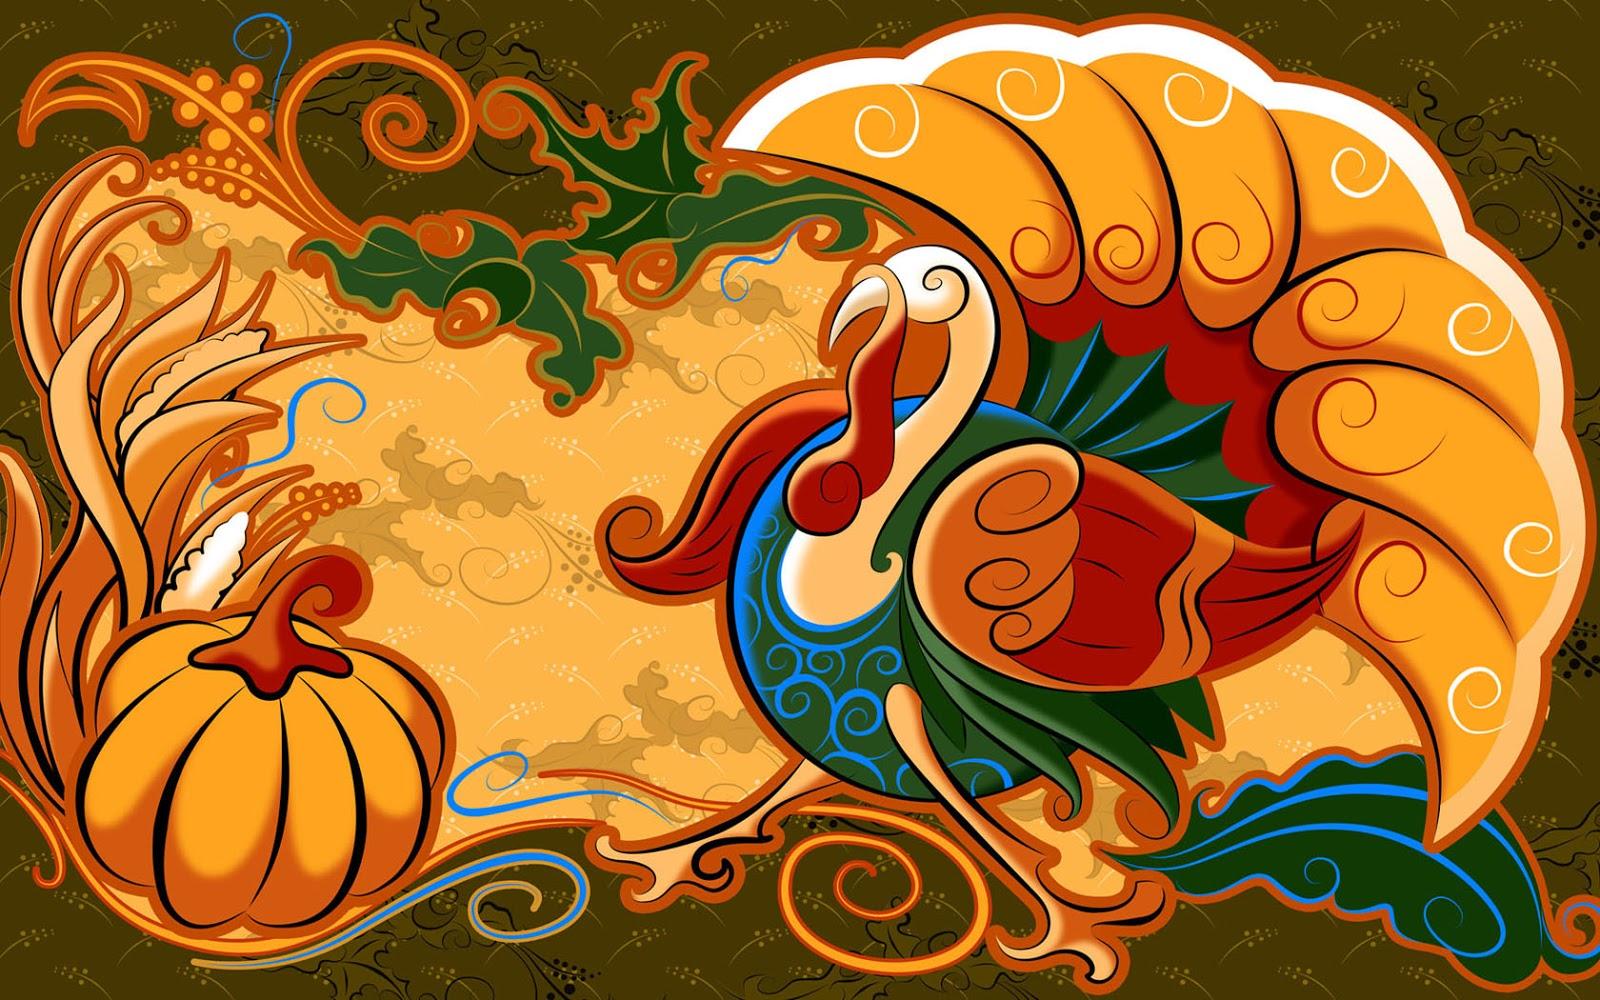 http://4.bp.blogspot.com/-B0lHEQbEnlE/UKSPPee4xdI/AAAAAAAACCA/8P44Ov3_bcg/s1600/Thanksgiving-Day-1-A3B5U74TZJ-1680x1050.jpg